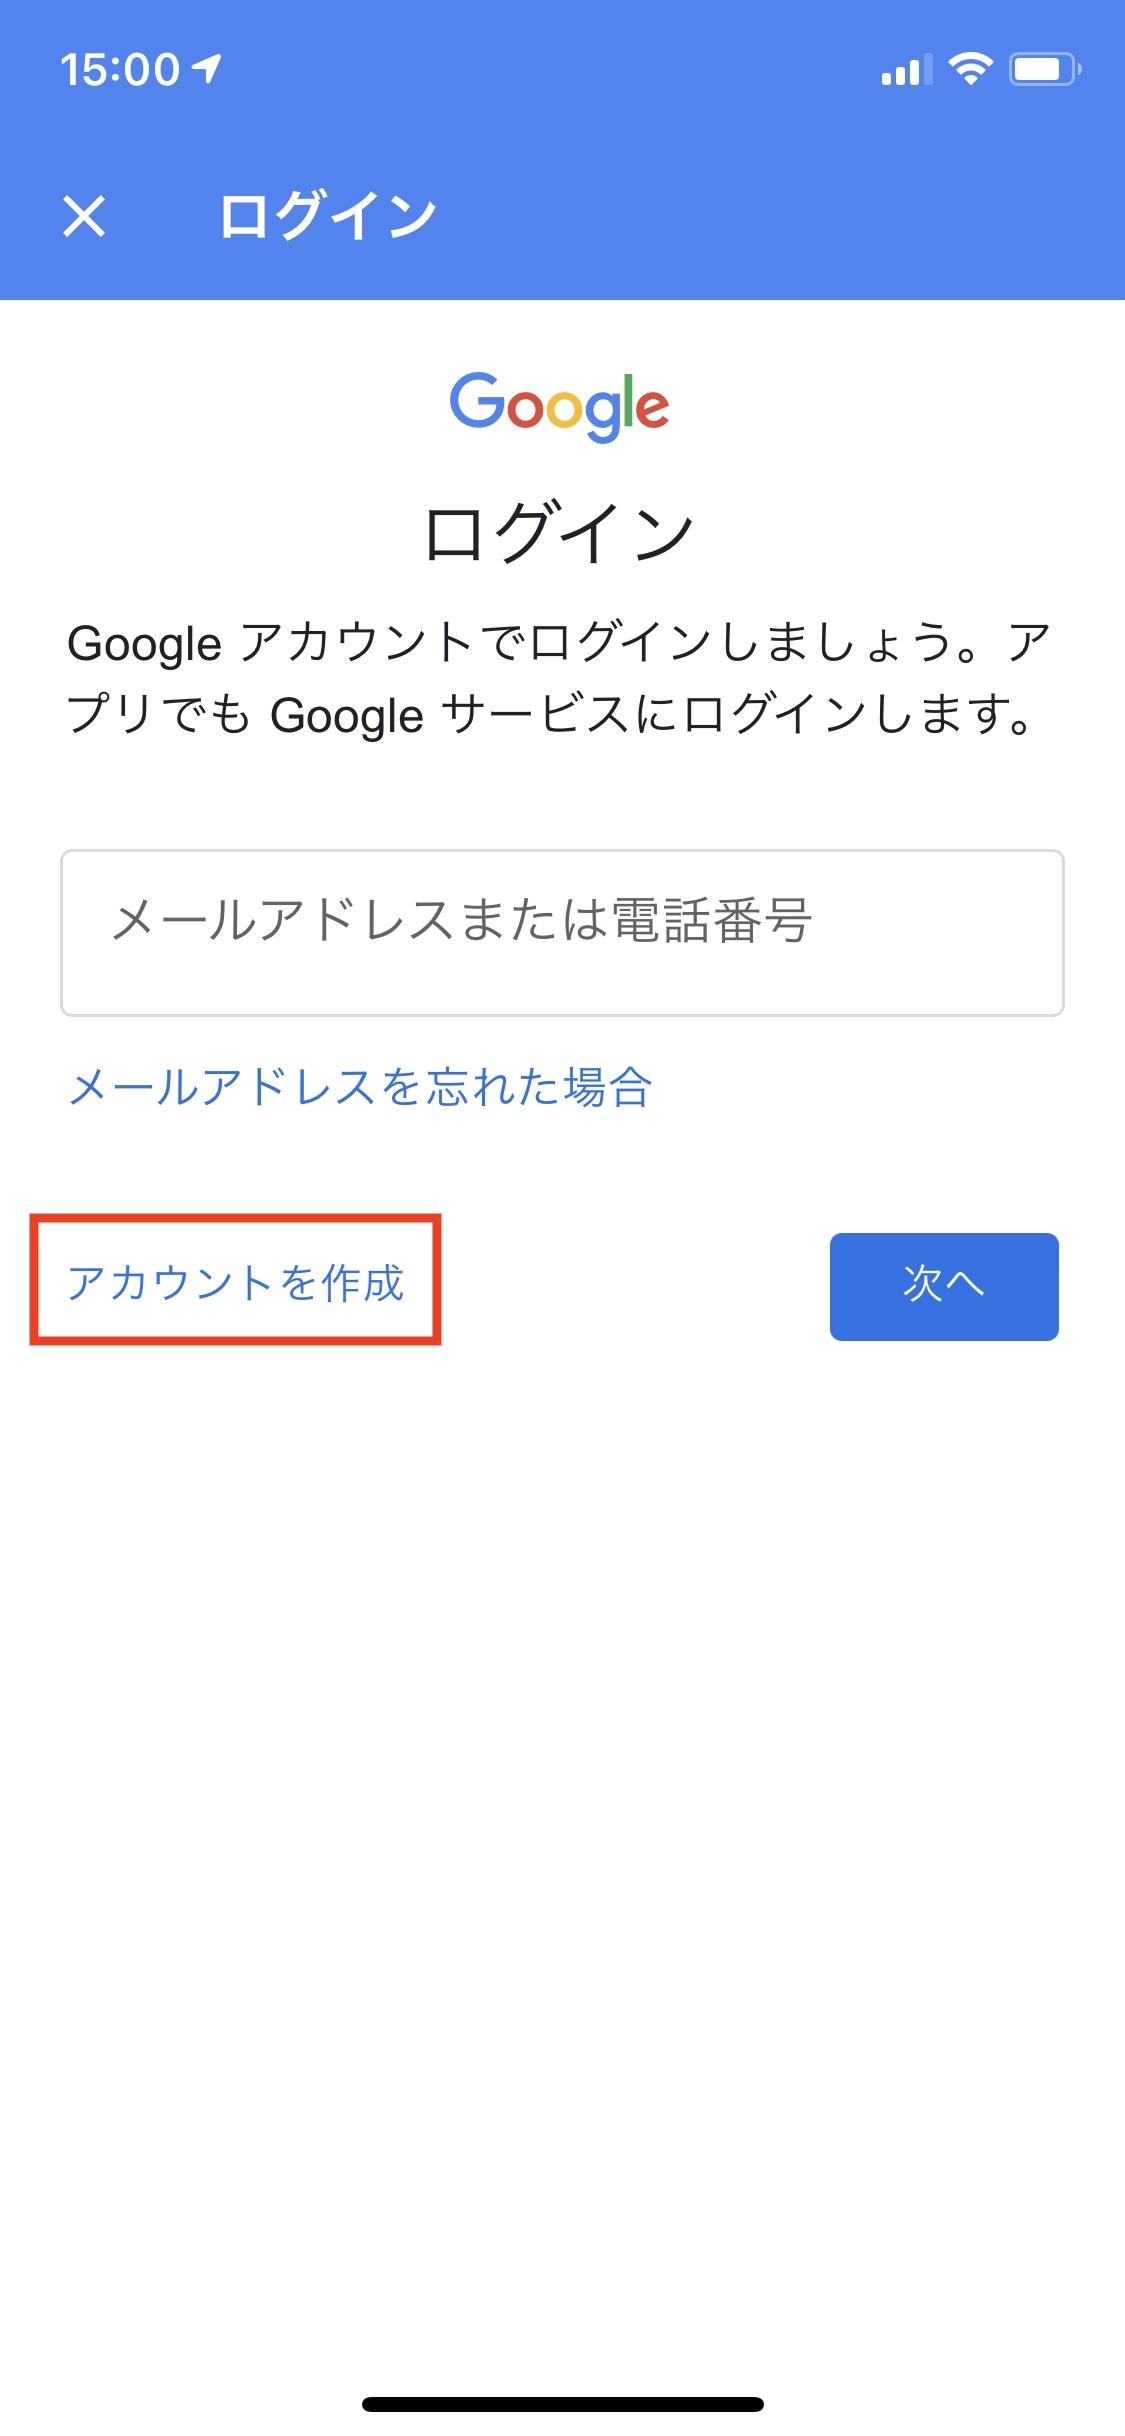 Google Chromeのアカウント作成画面